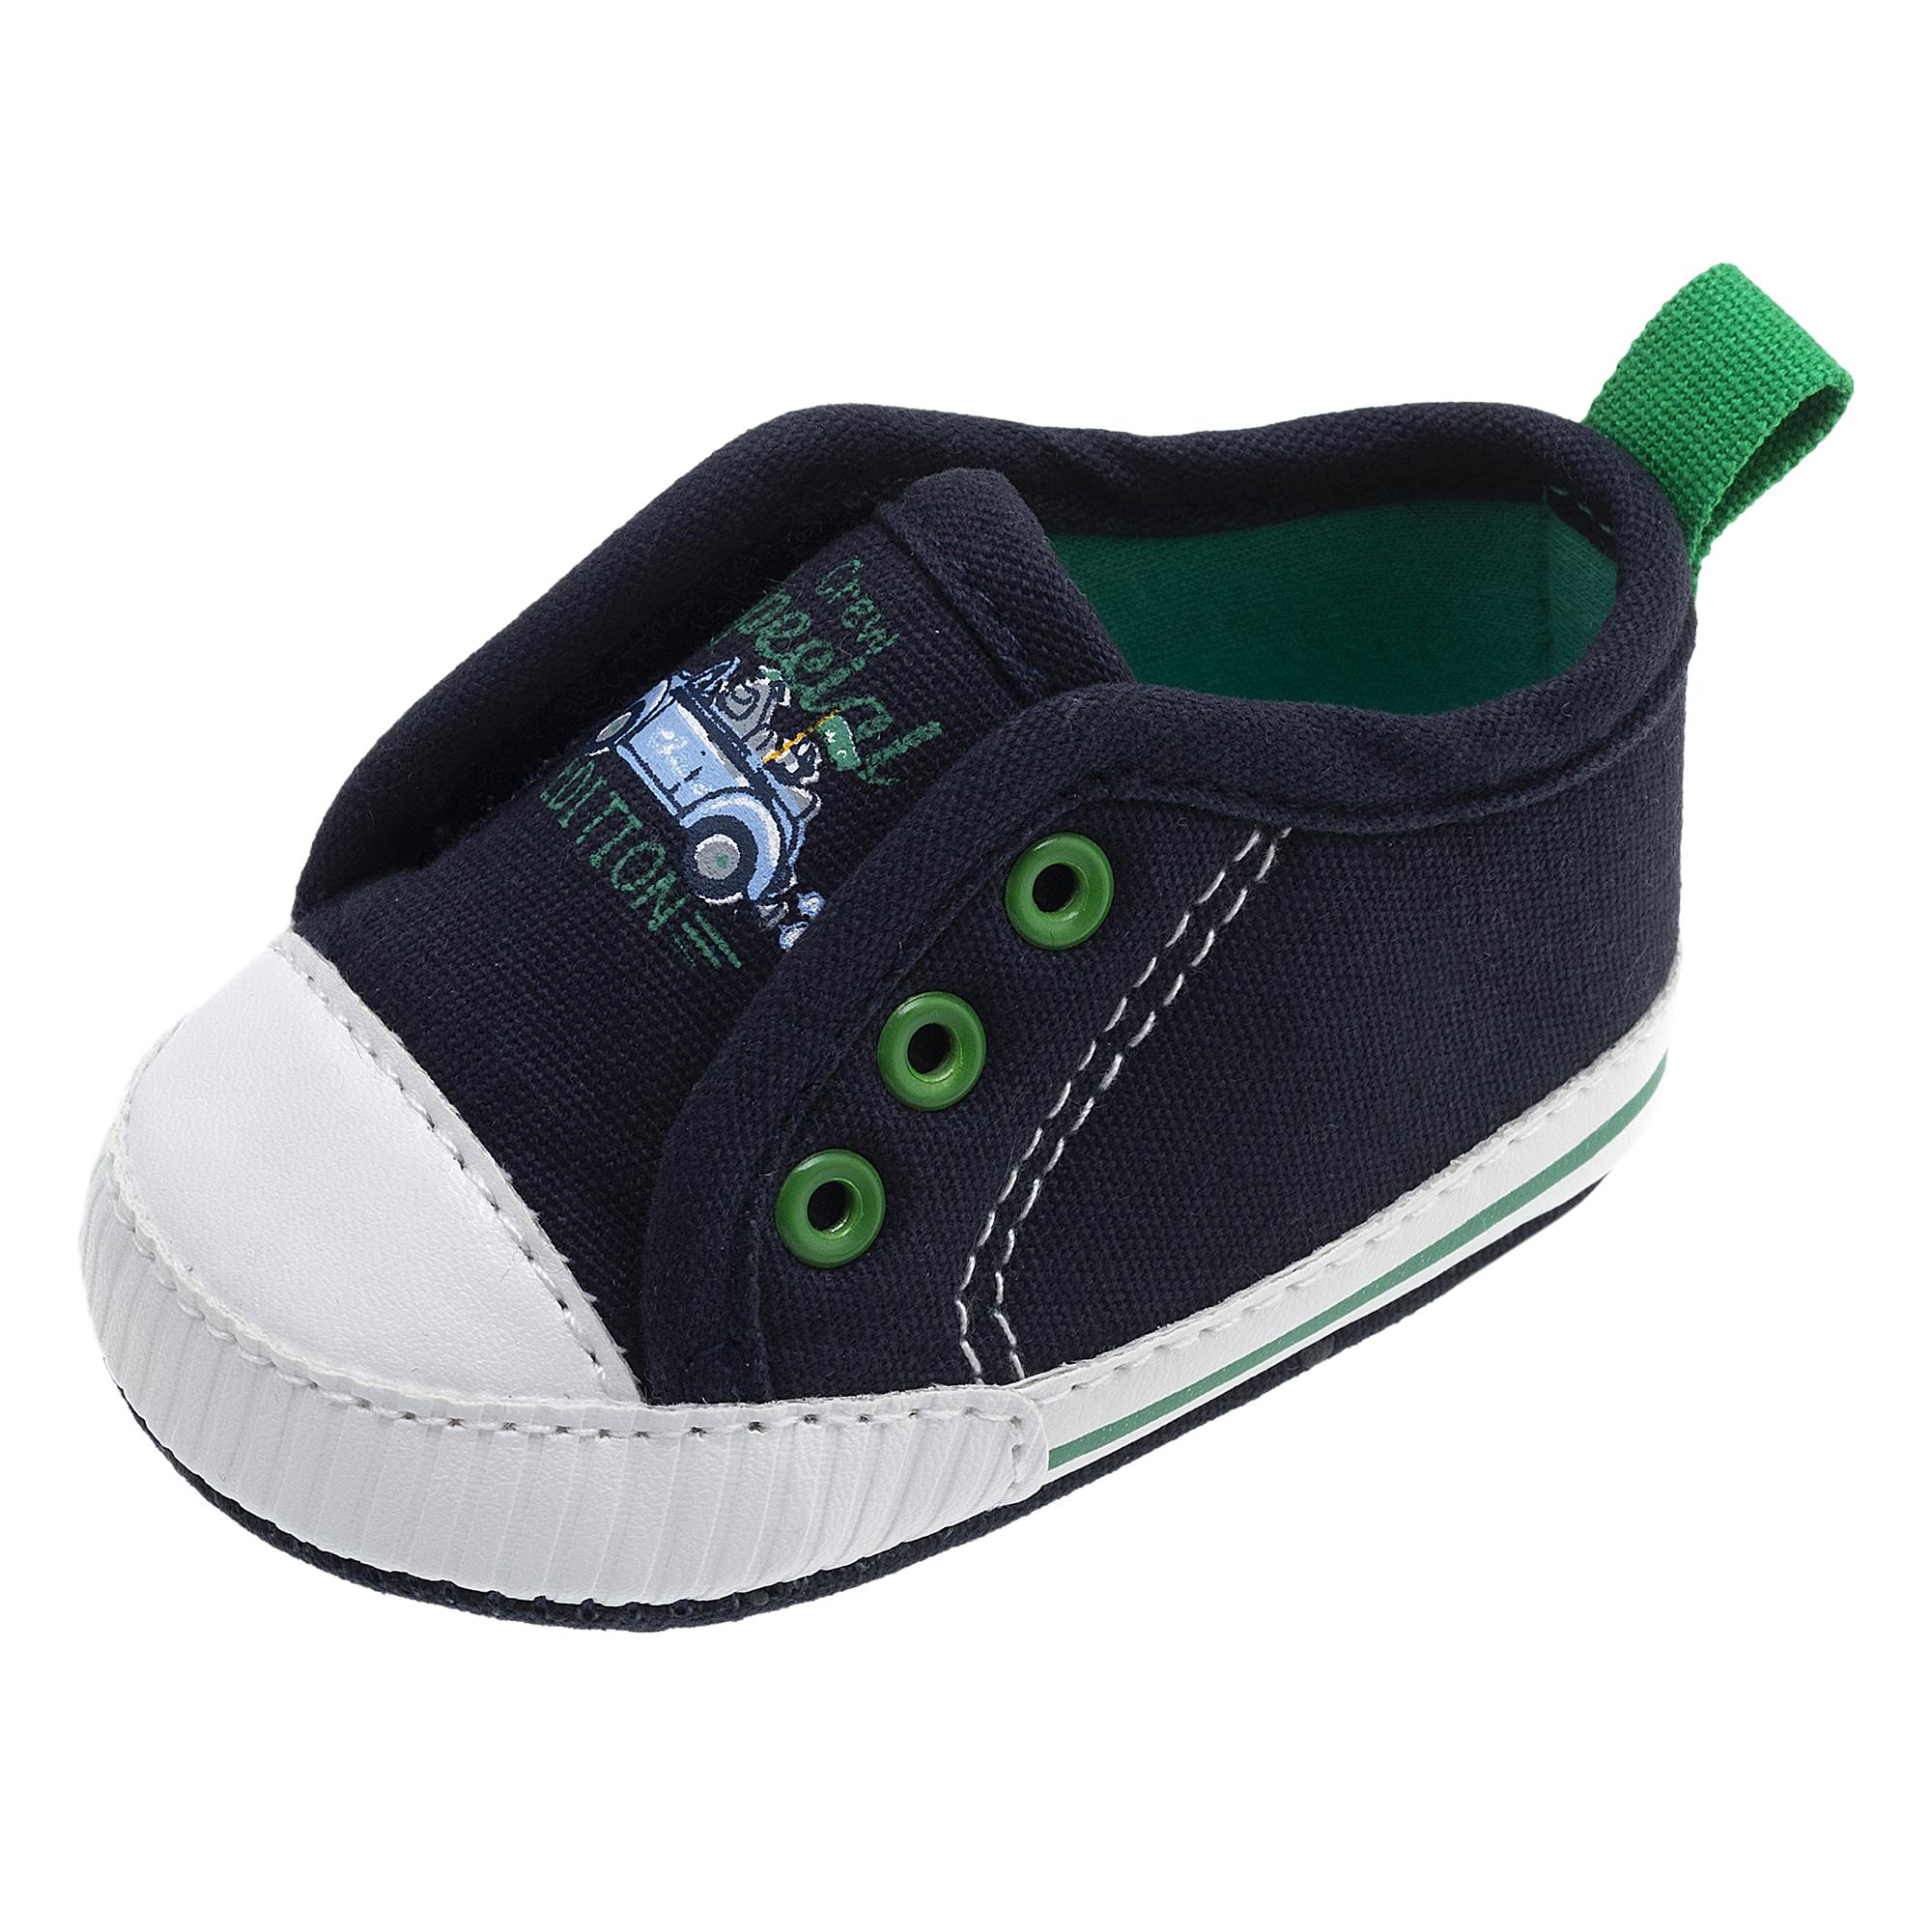 Pantofi Copii Chicco Olivier, Bleumarin, 63119 imagine